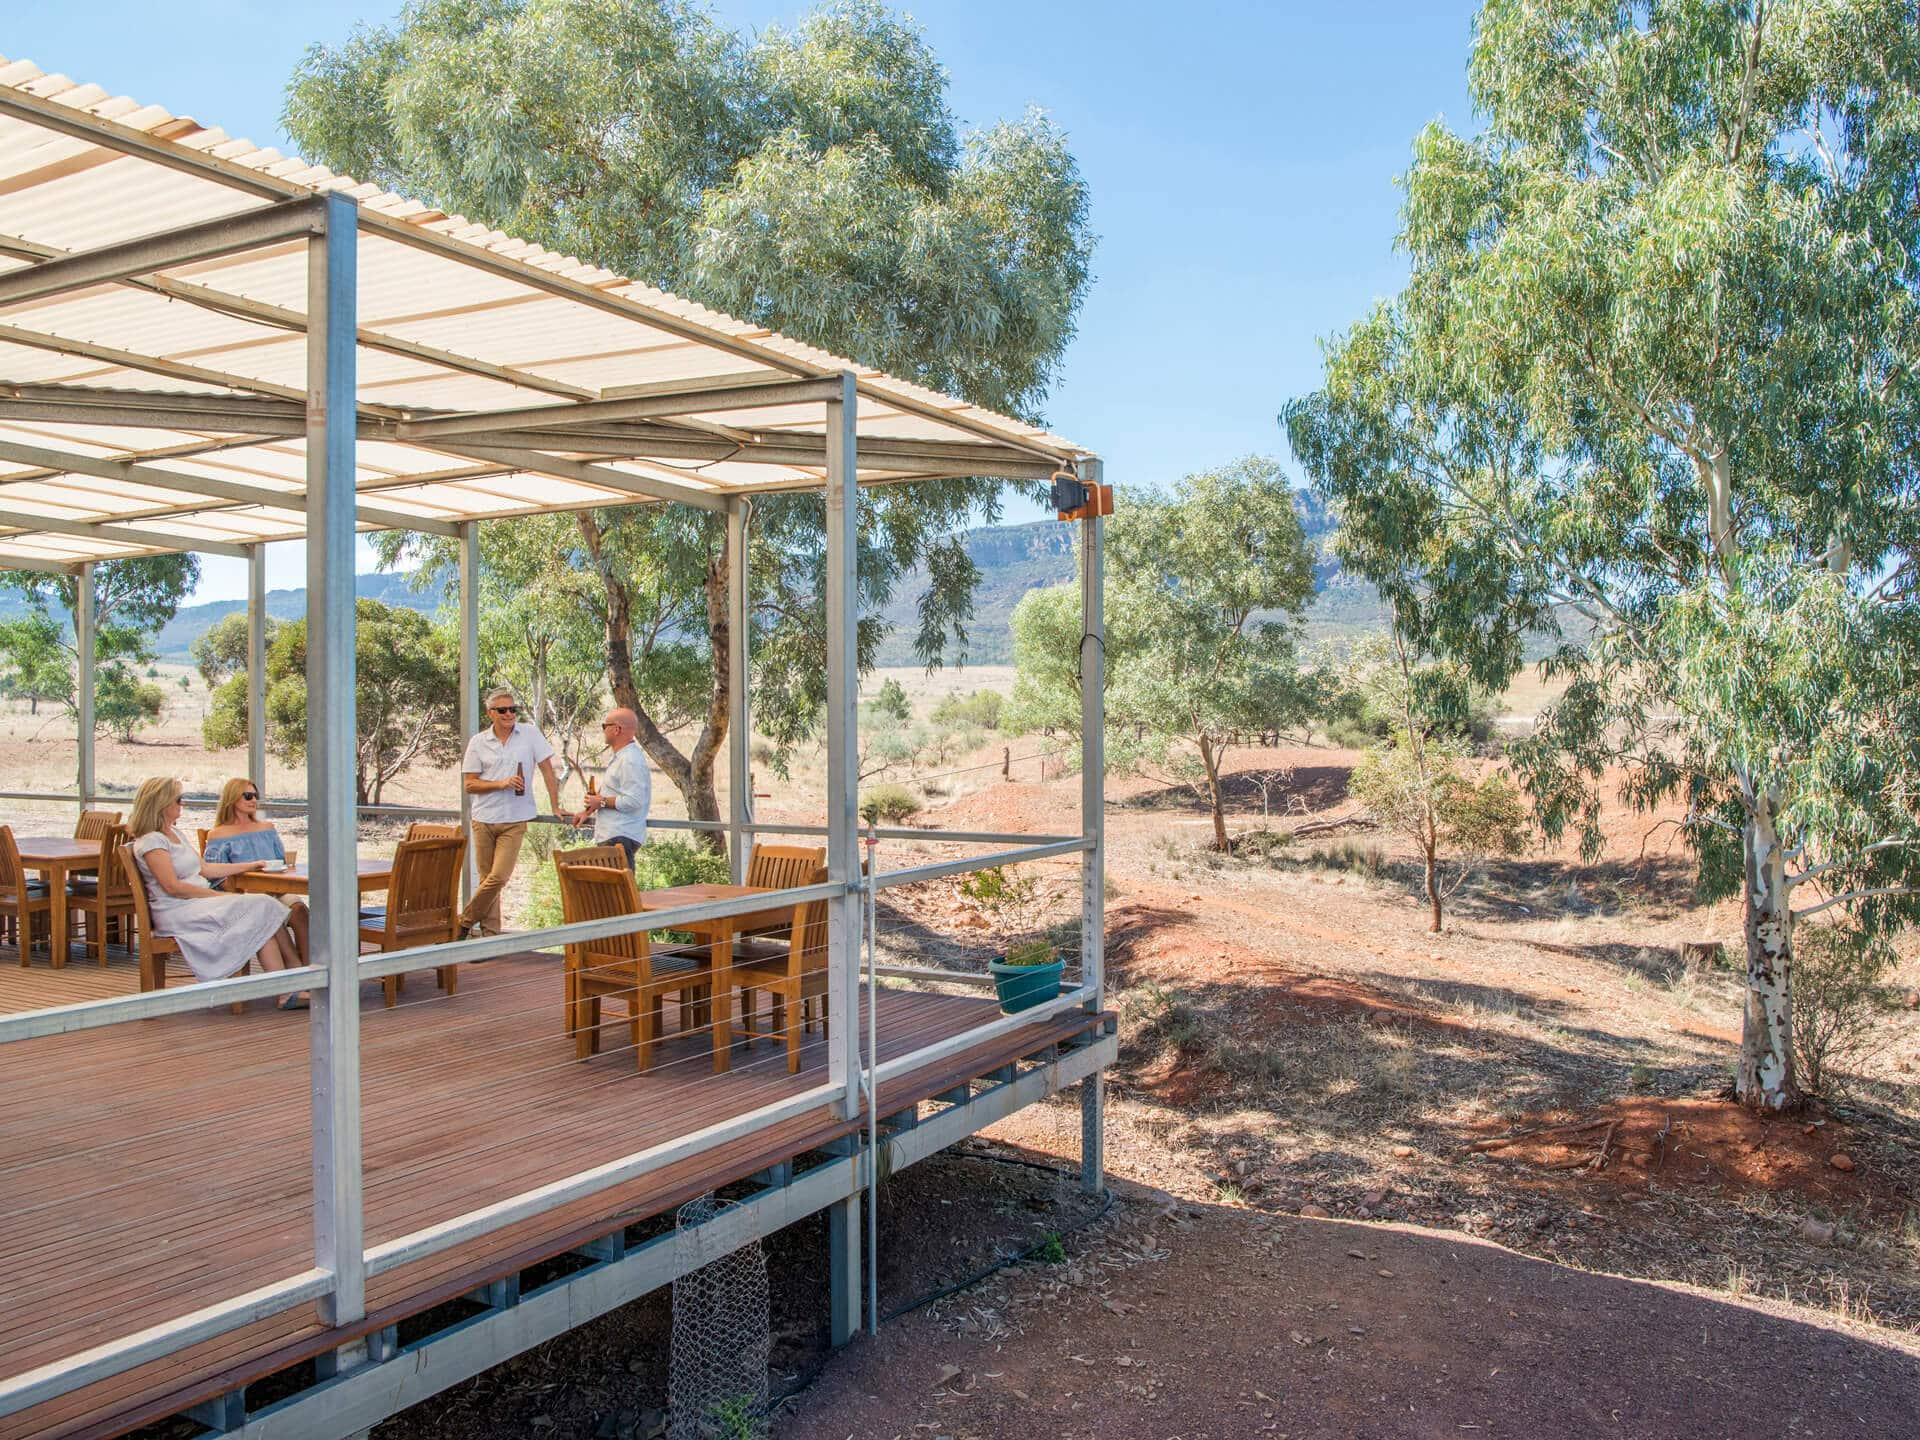 People enjoying drinks on a balcony in Flinders Ranges